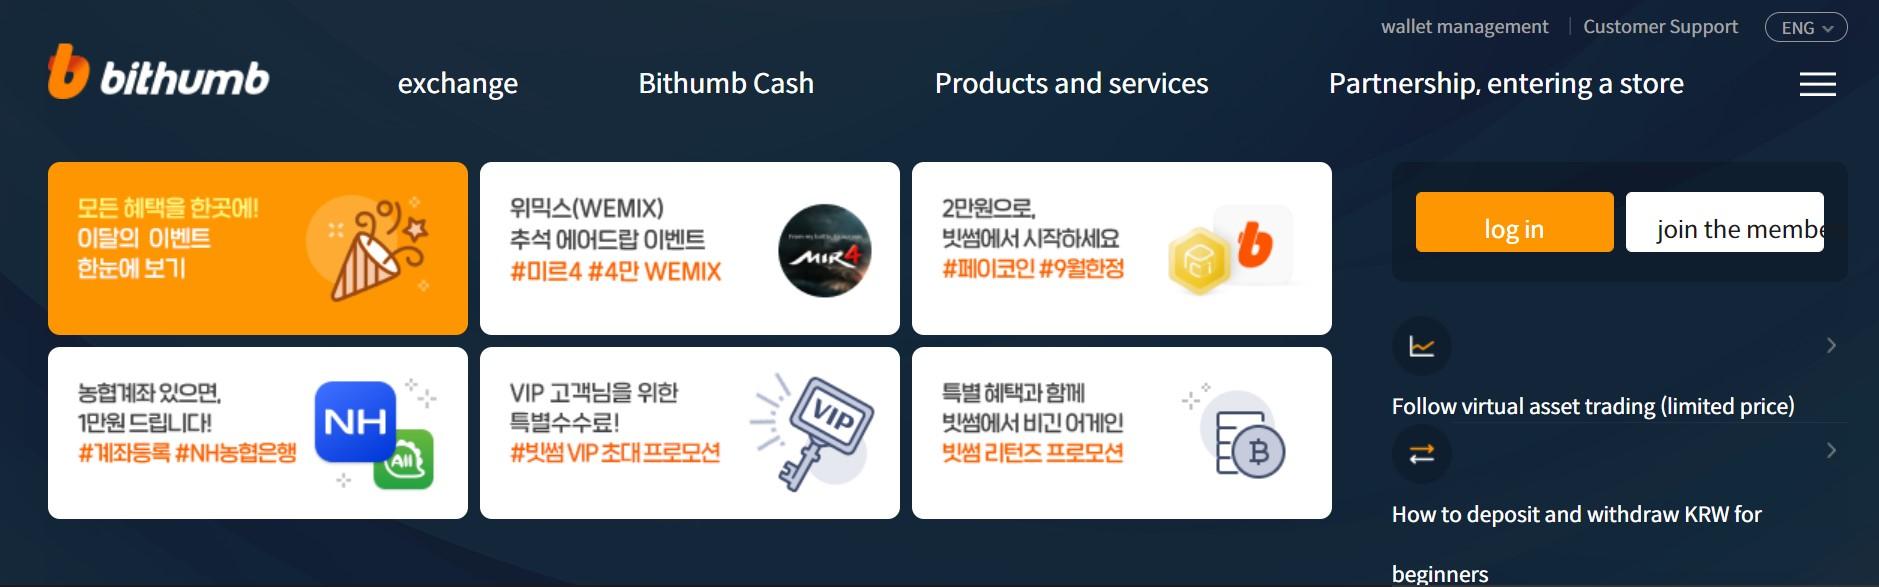 Bithumb trading platform